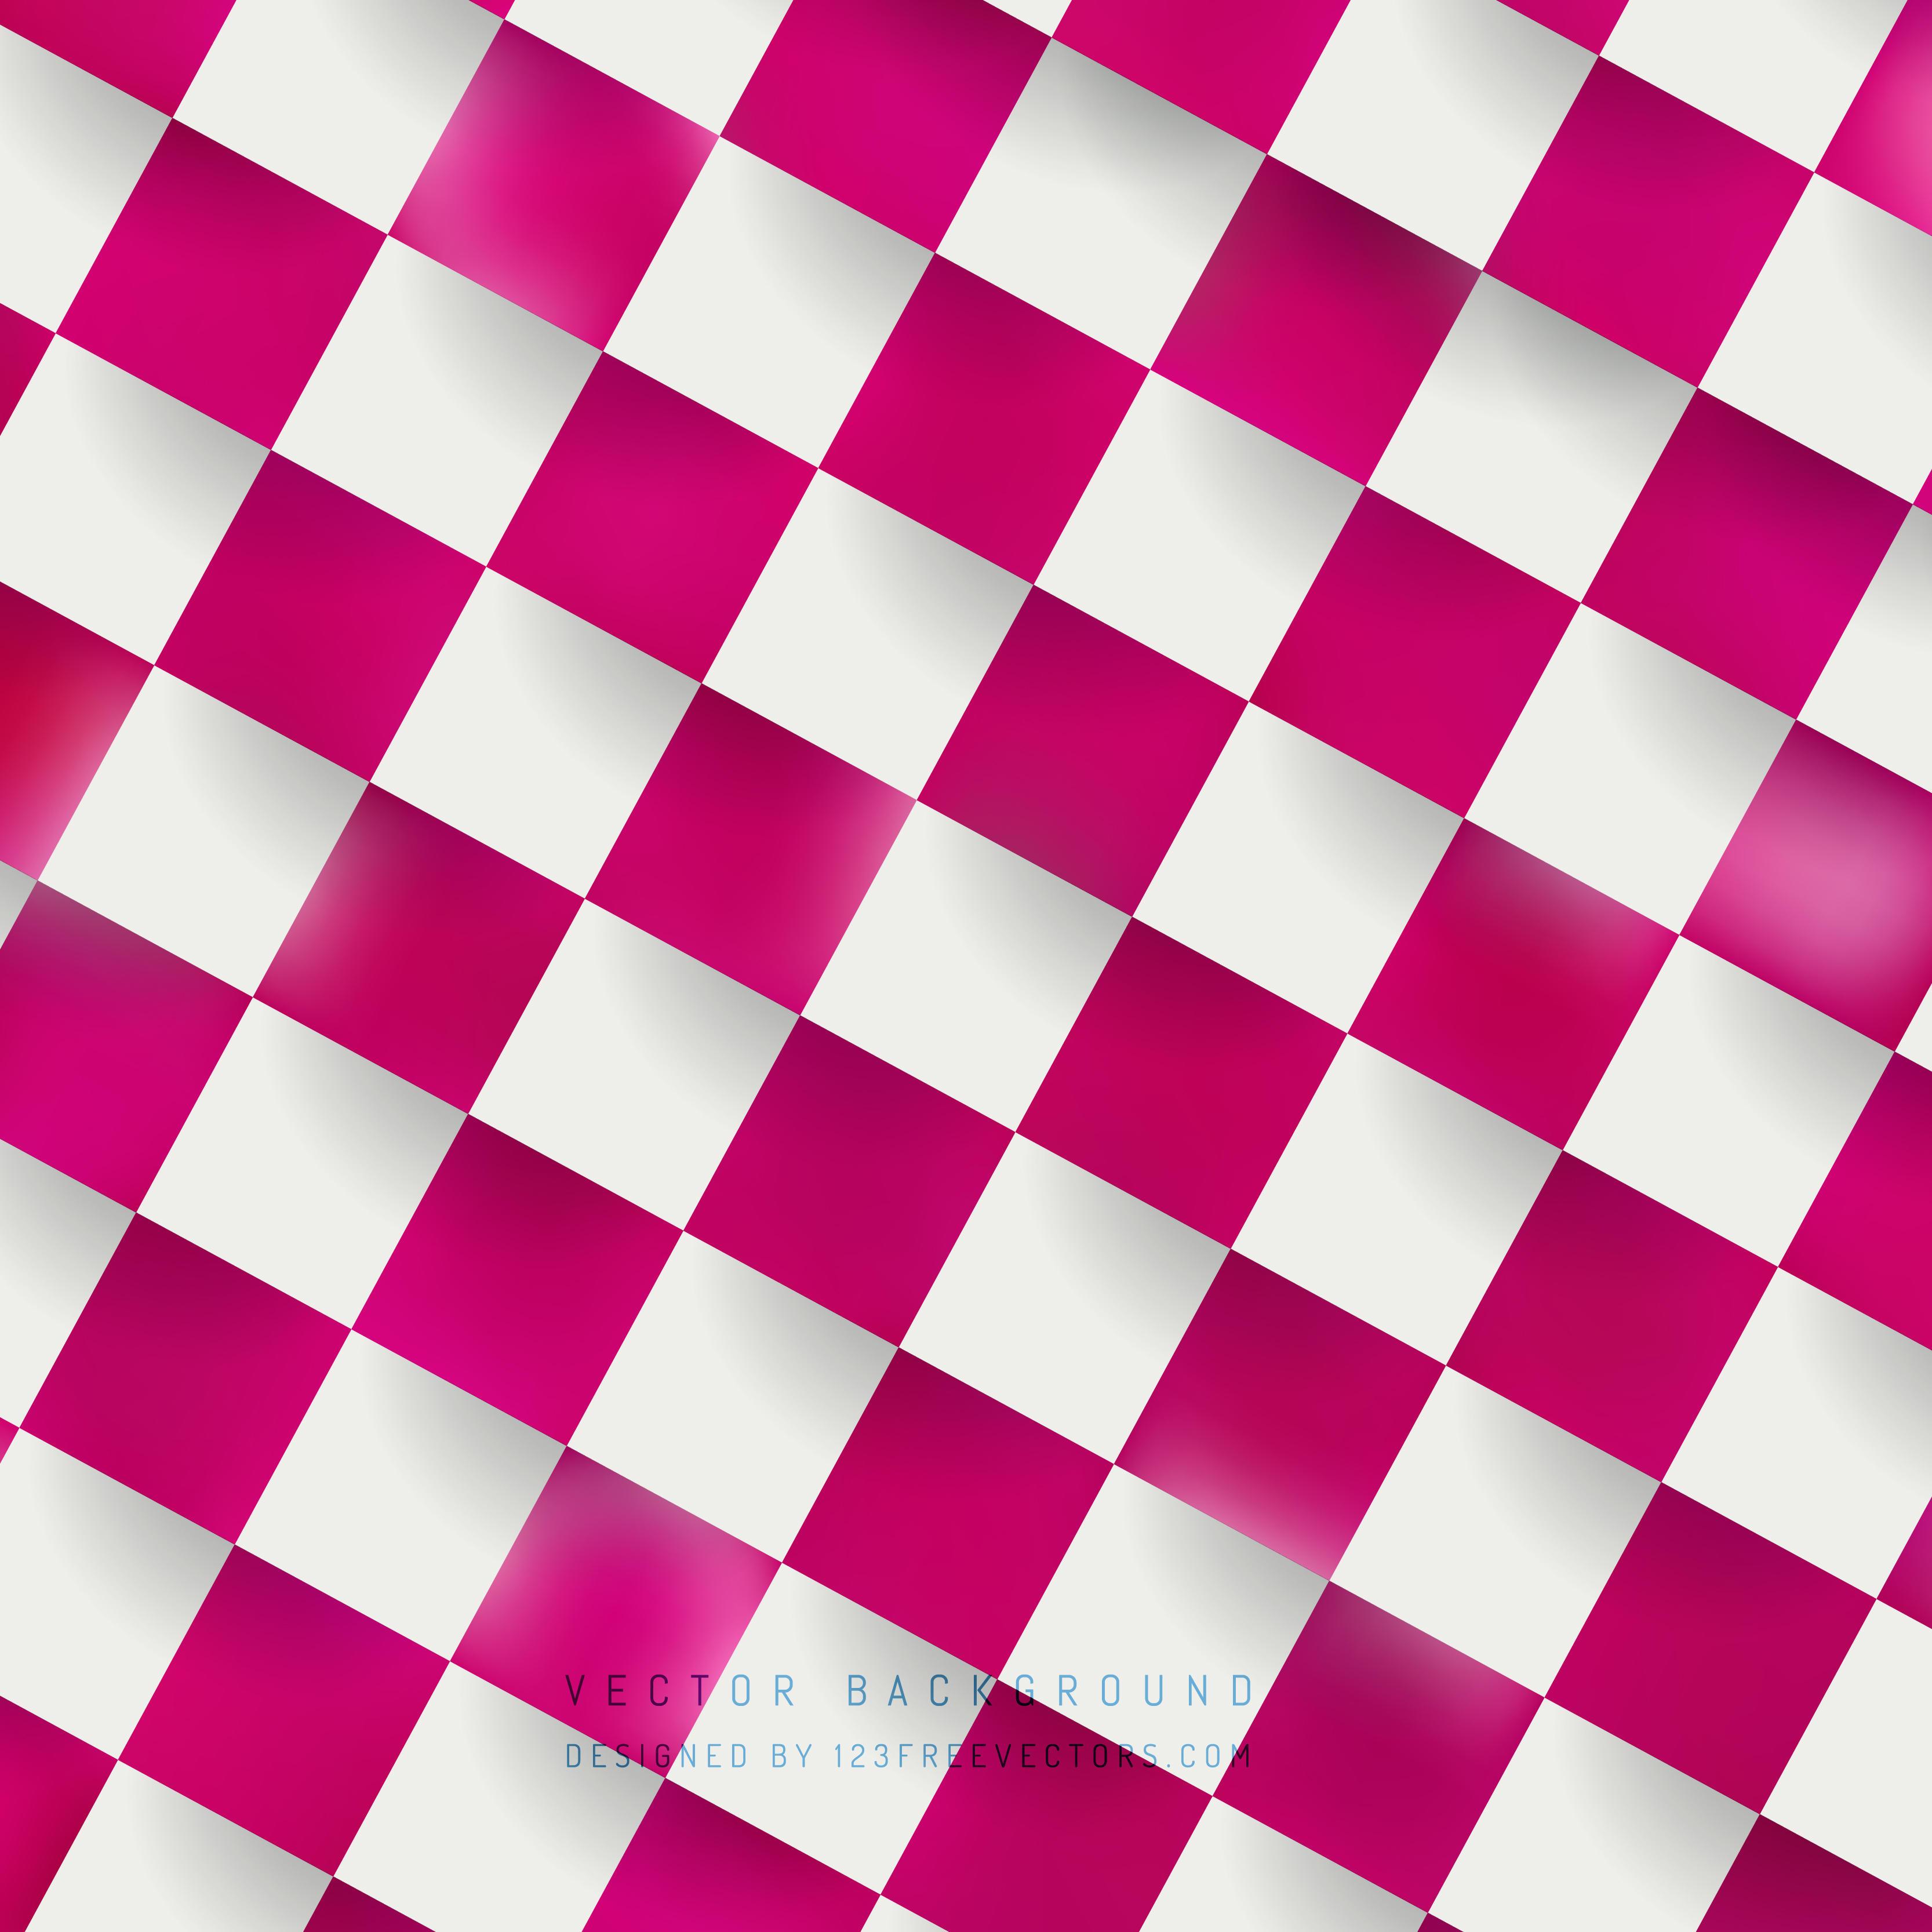 Checkered Design 90 Checkered Pattern Vectors Download Free Vector Art